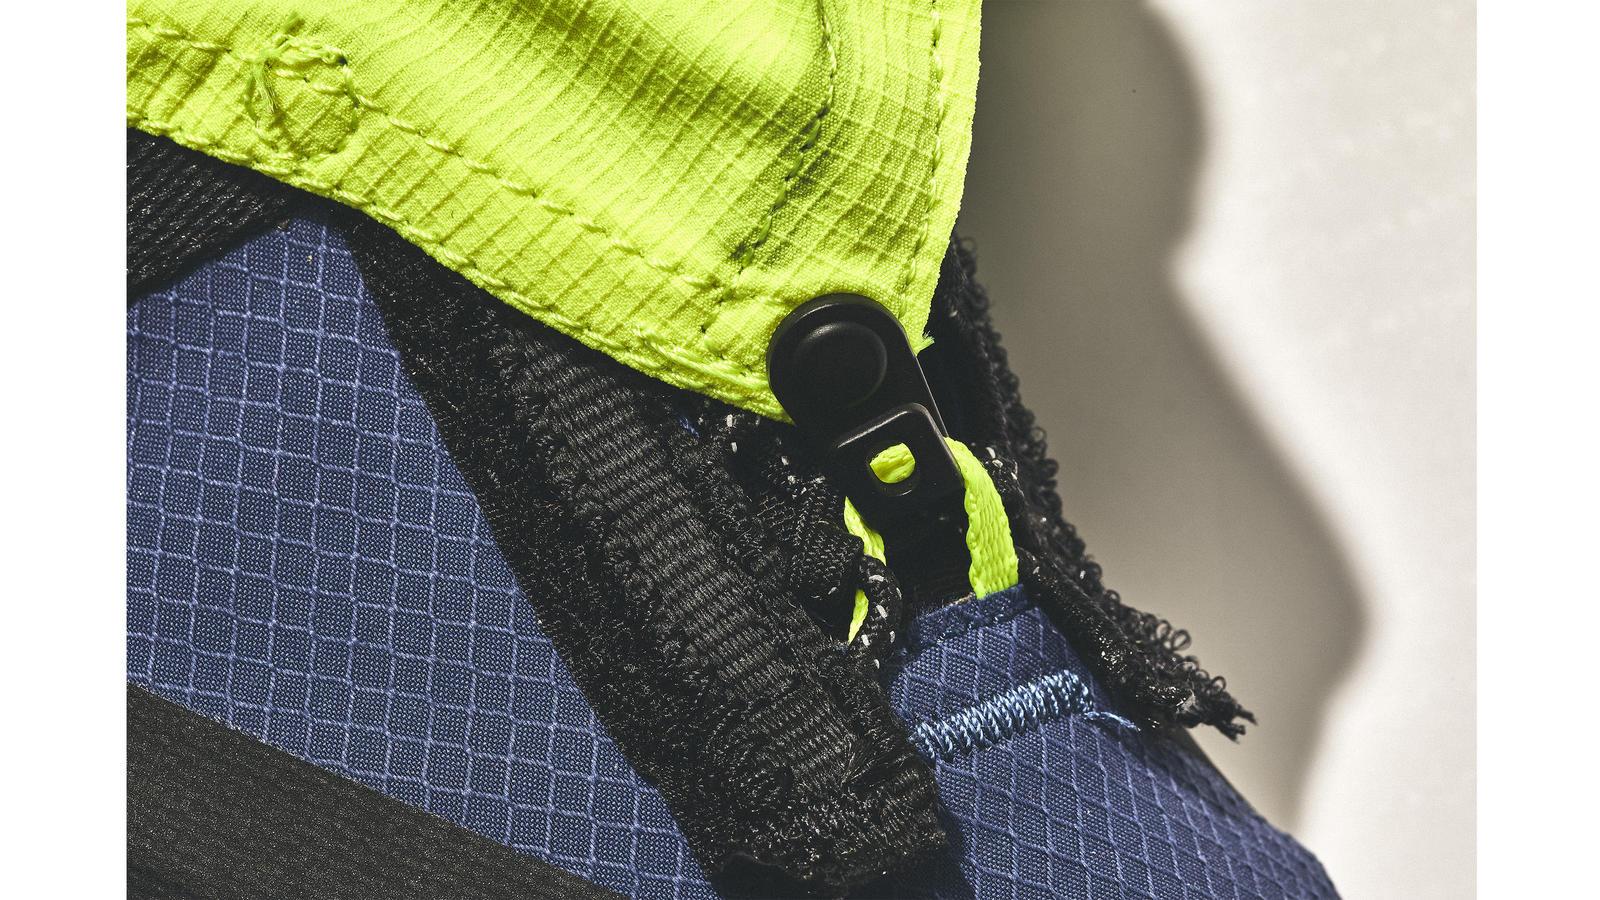 Nike ISPA Drifter Gator 22